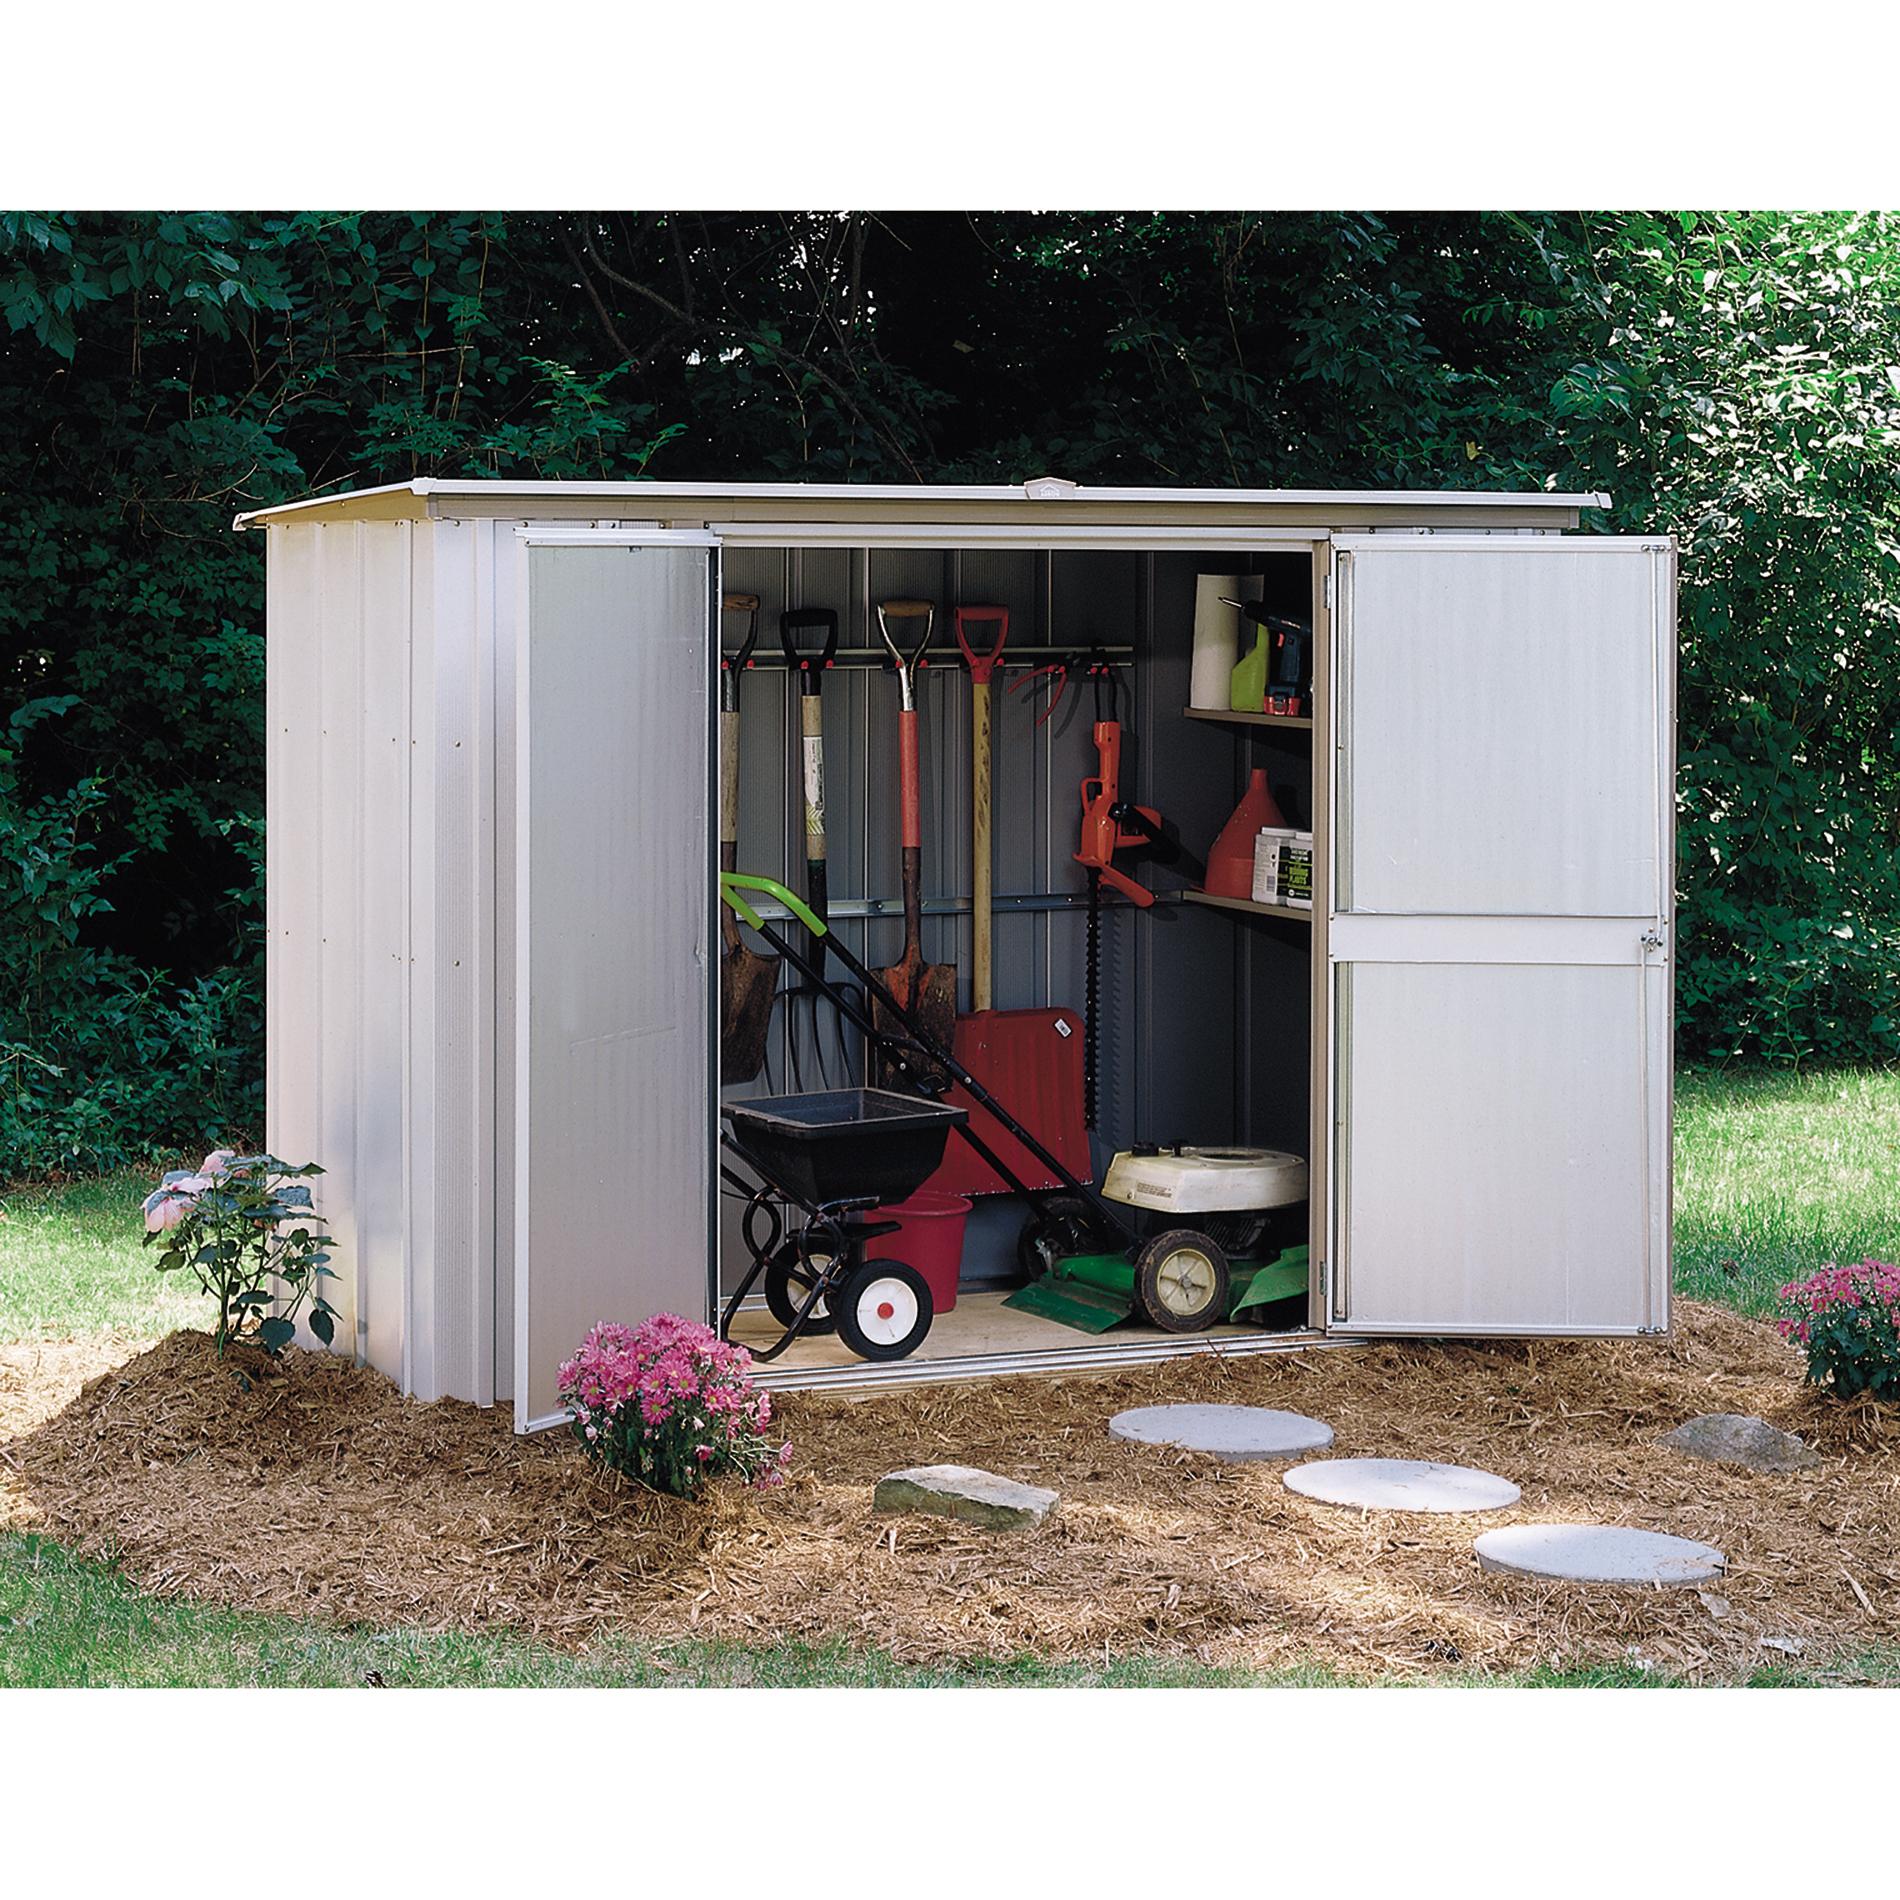 Superieur Arrow GS83 8u0027 X 3u0027 Garden Shed Storage Building